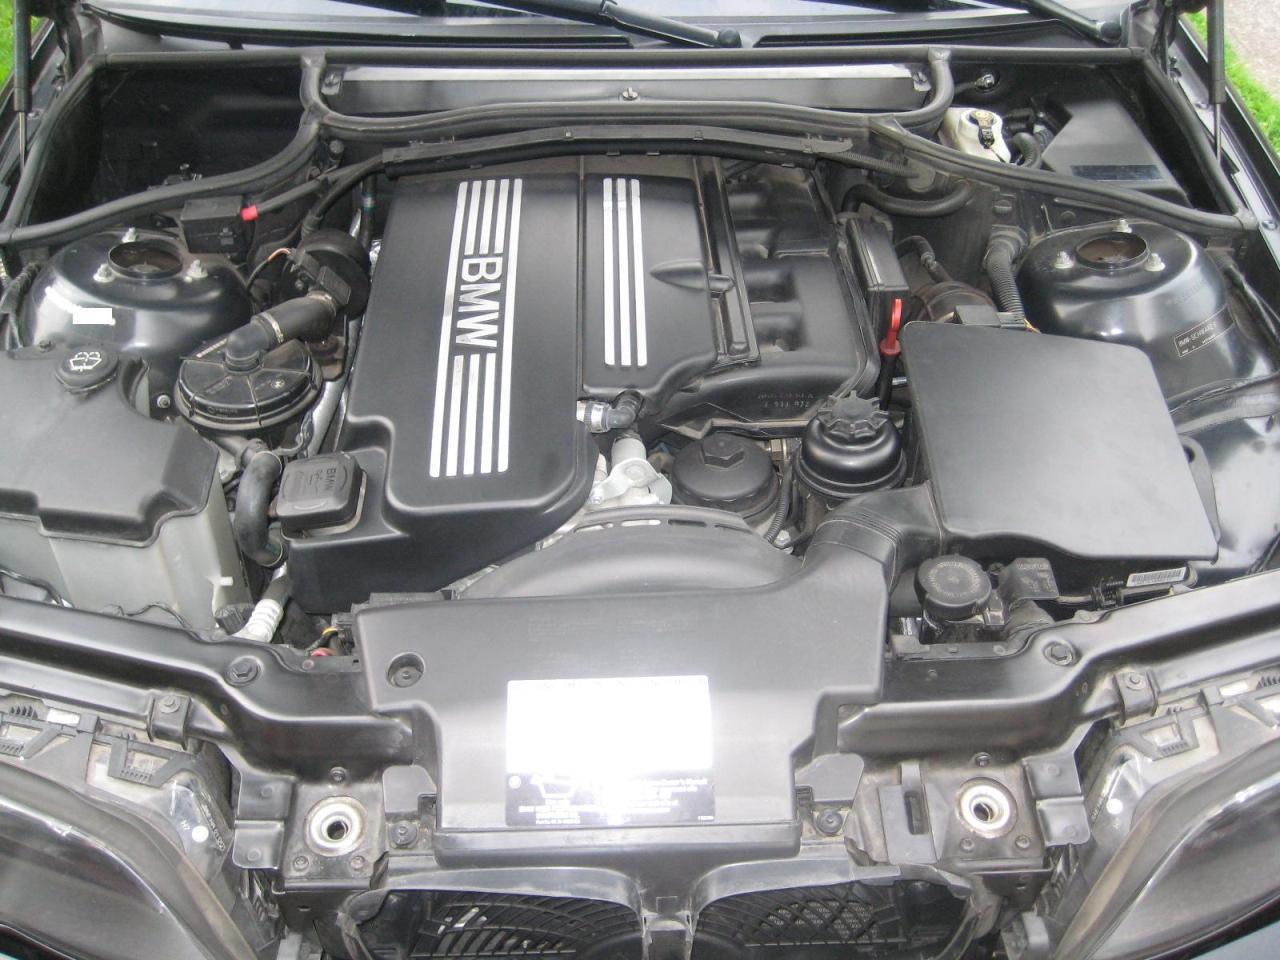 Bmw E36 M3 Engine Oil Diagram Electrical Wiring 2006 750i 330i 750li 1999 850csi